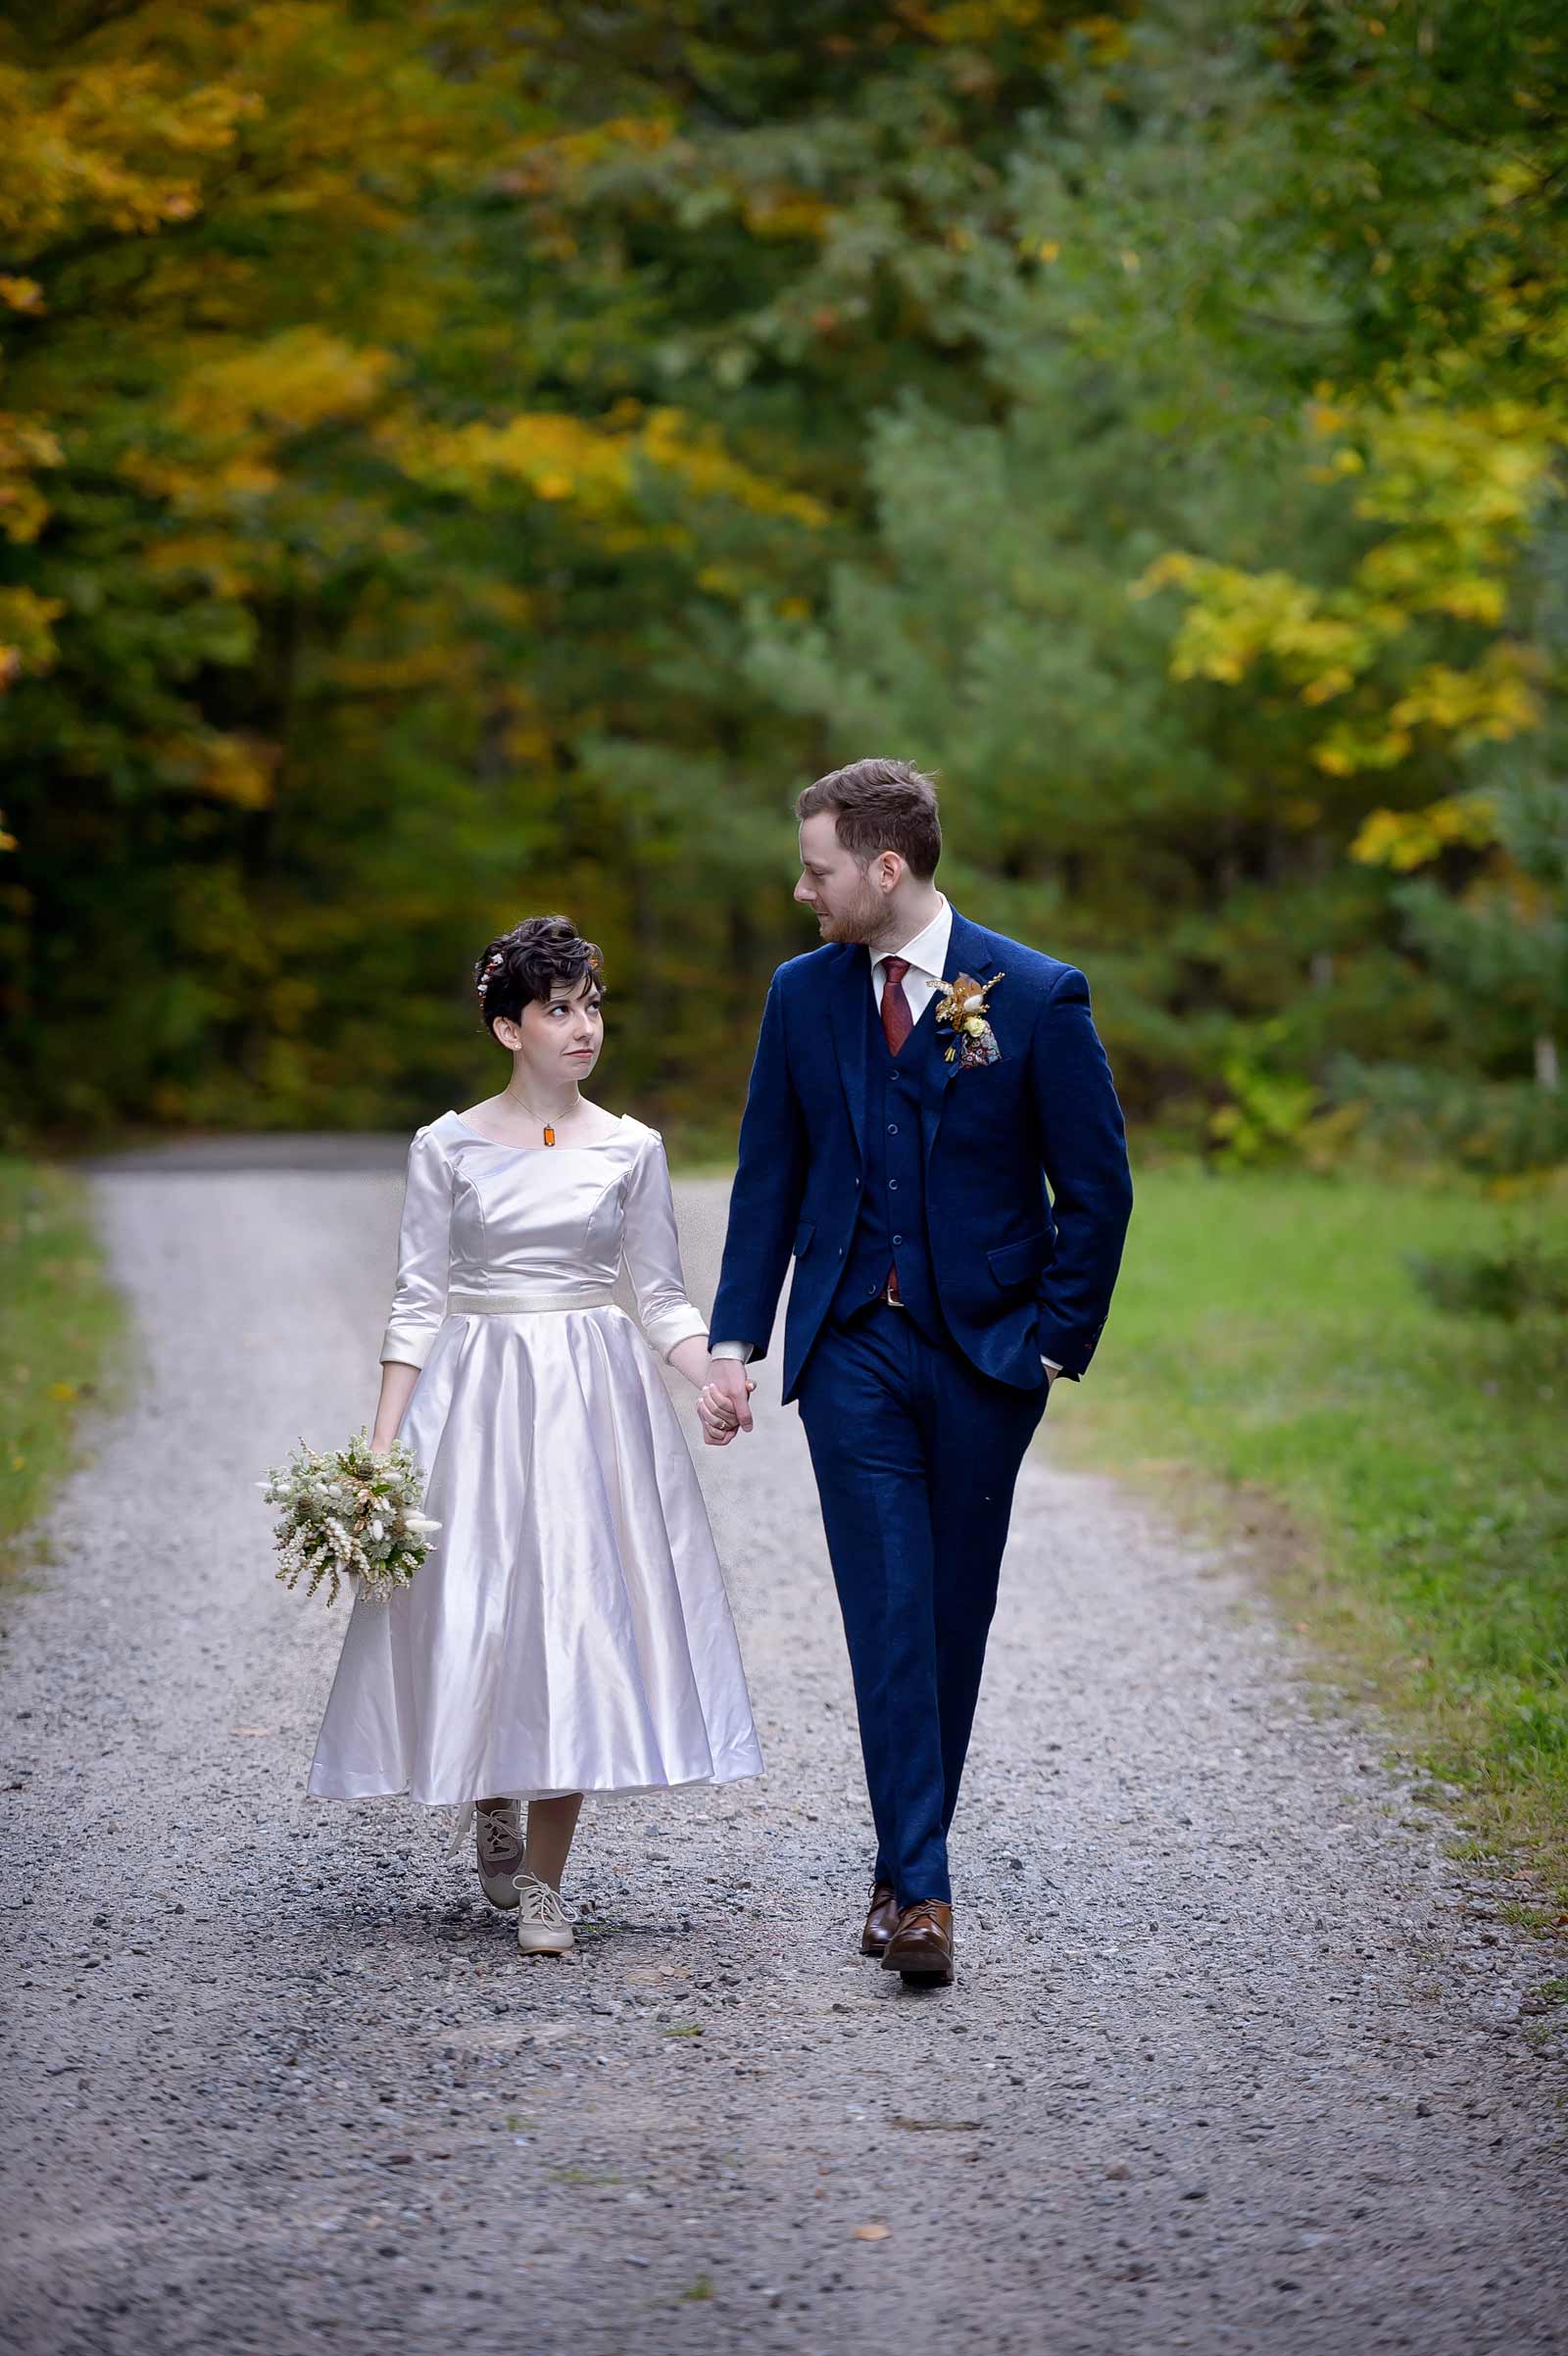 CharlieKieran-wedding-sneakpeek-16